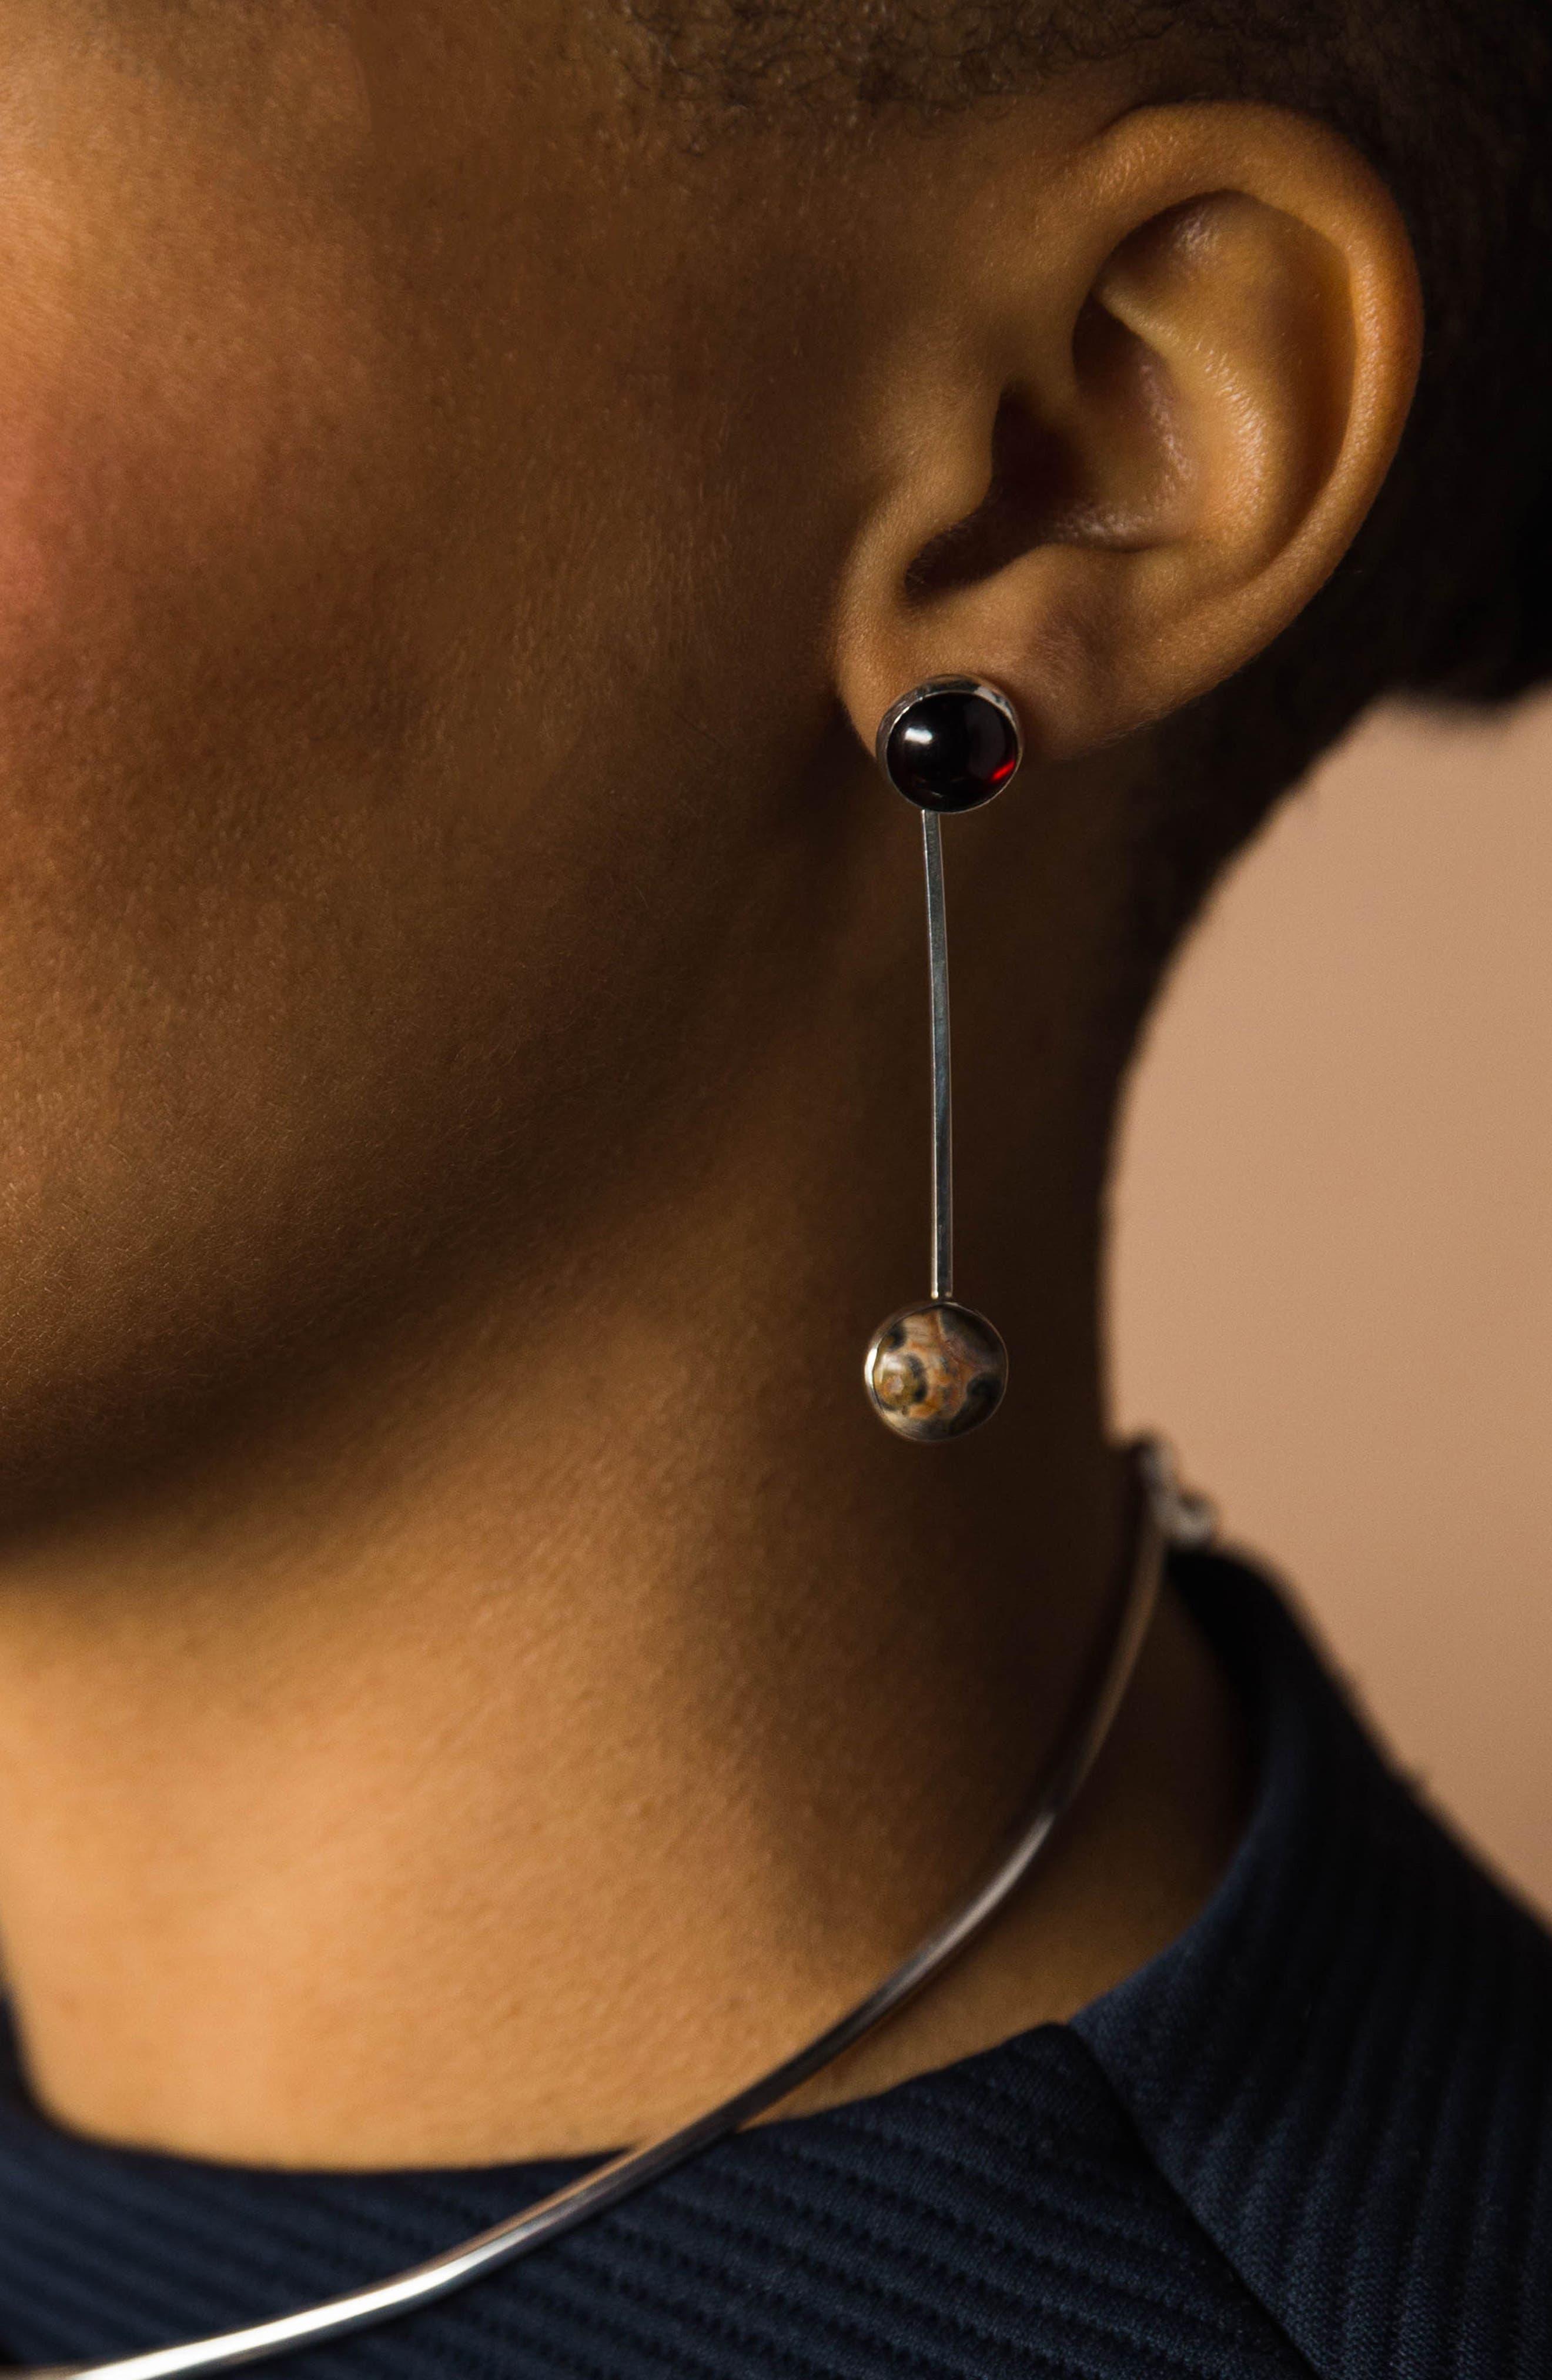 Sway Earring,                             Alternate thumbnail 2, color,                             Onyx/ Leopard